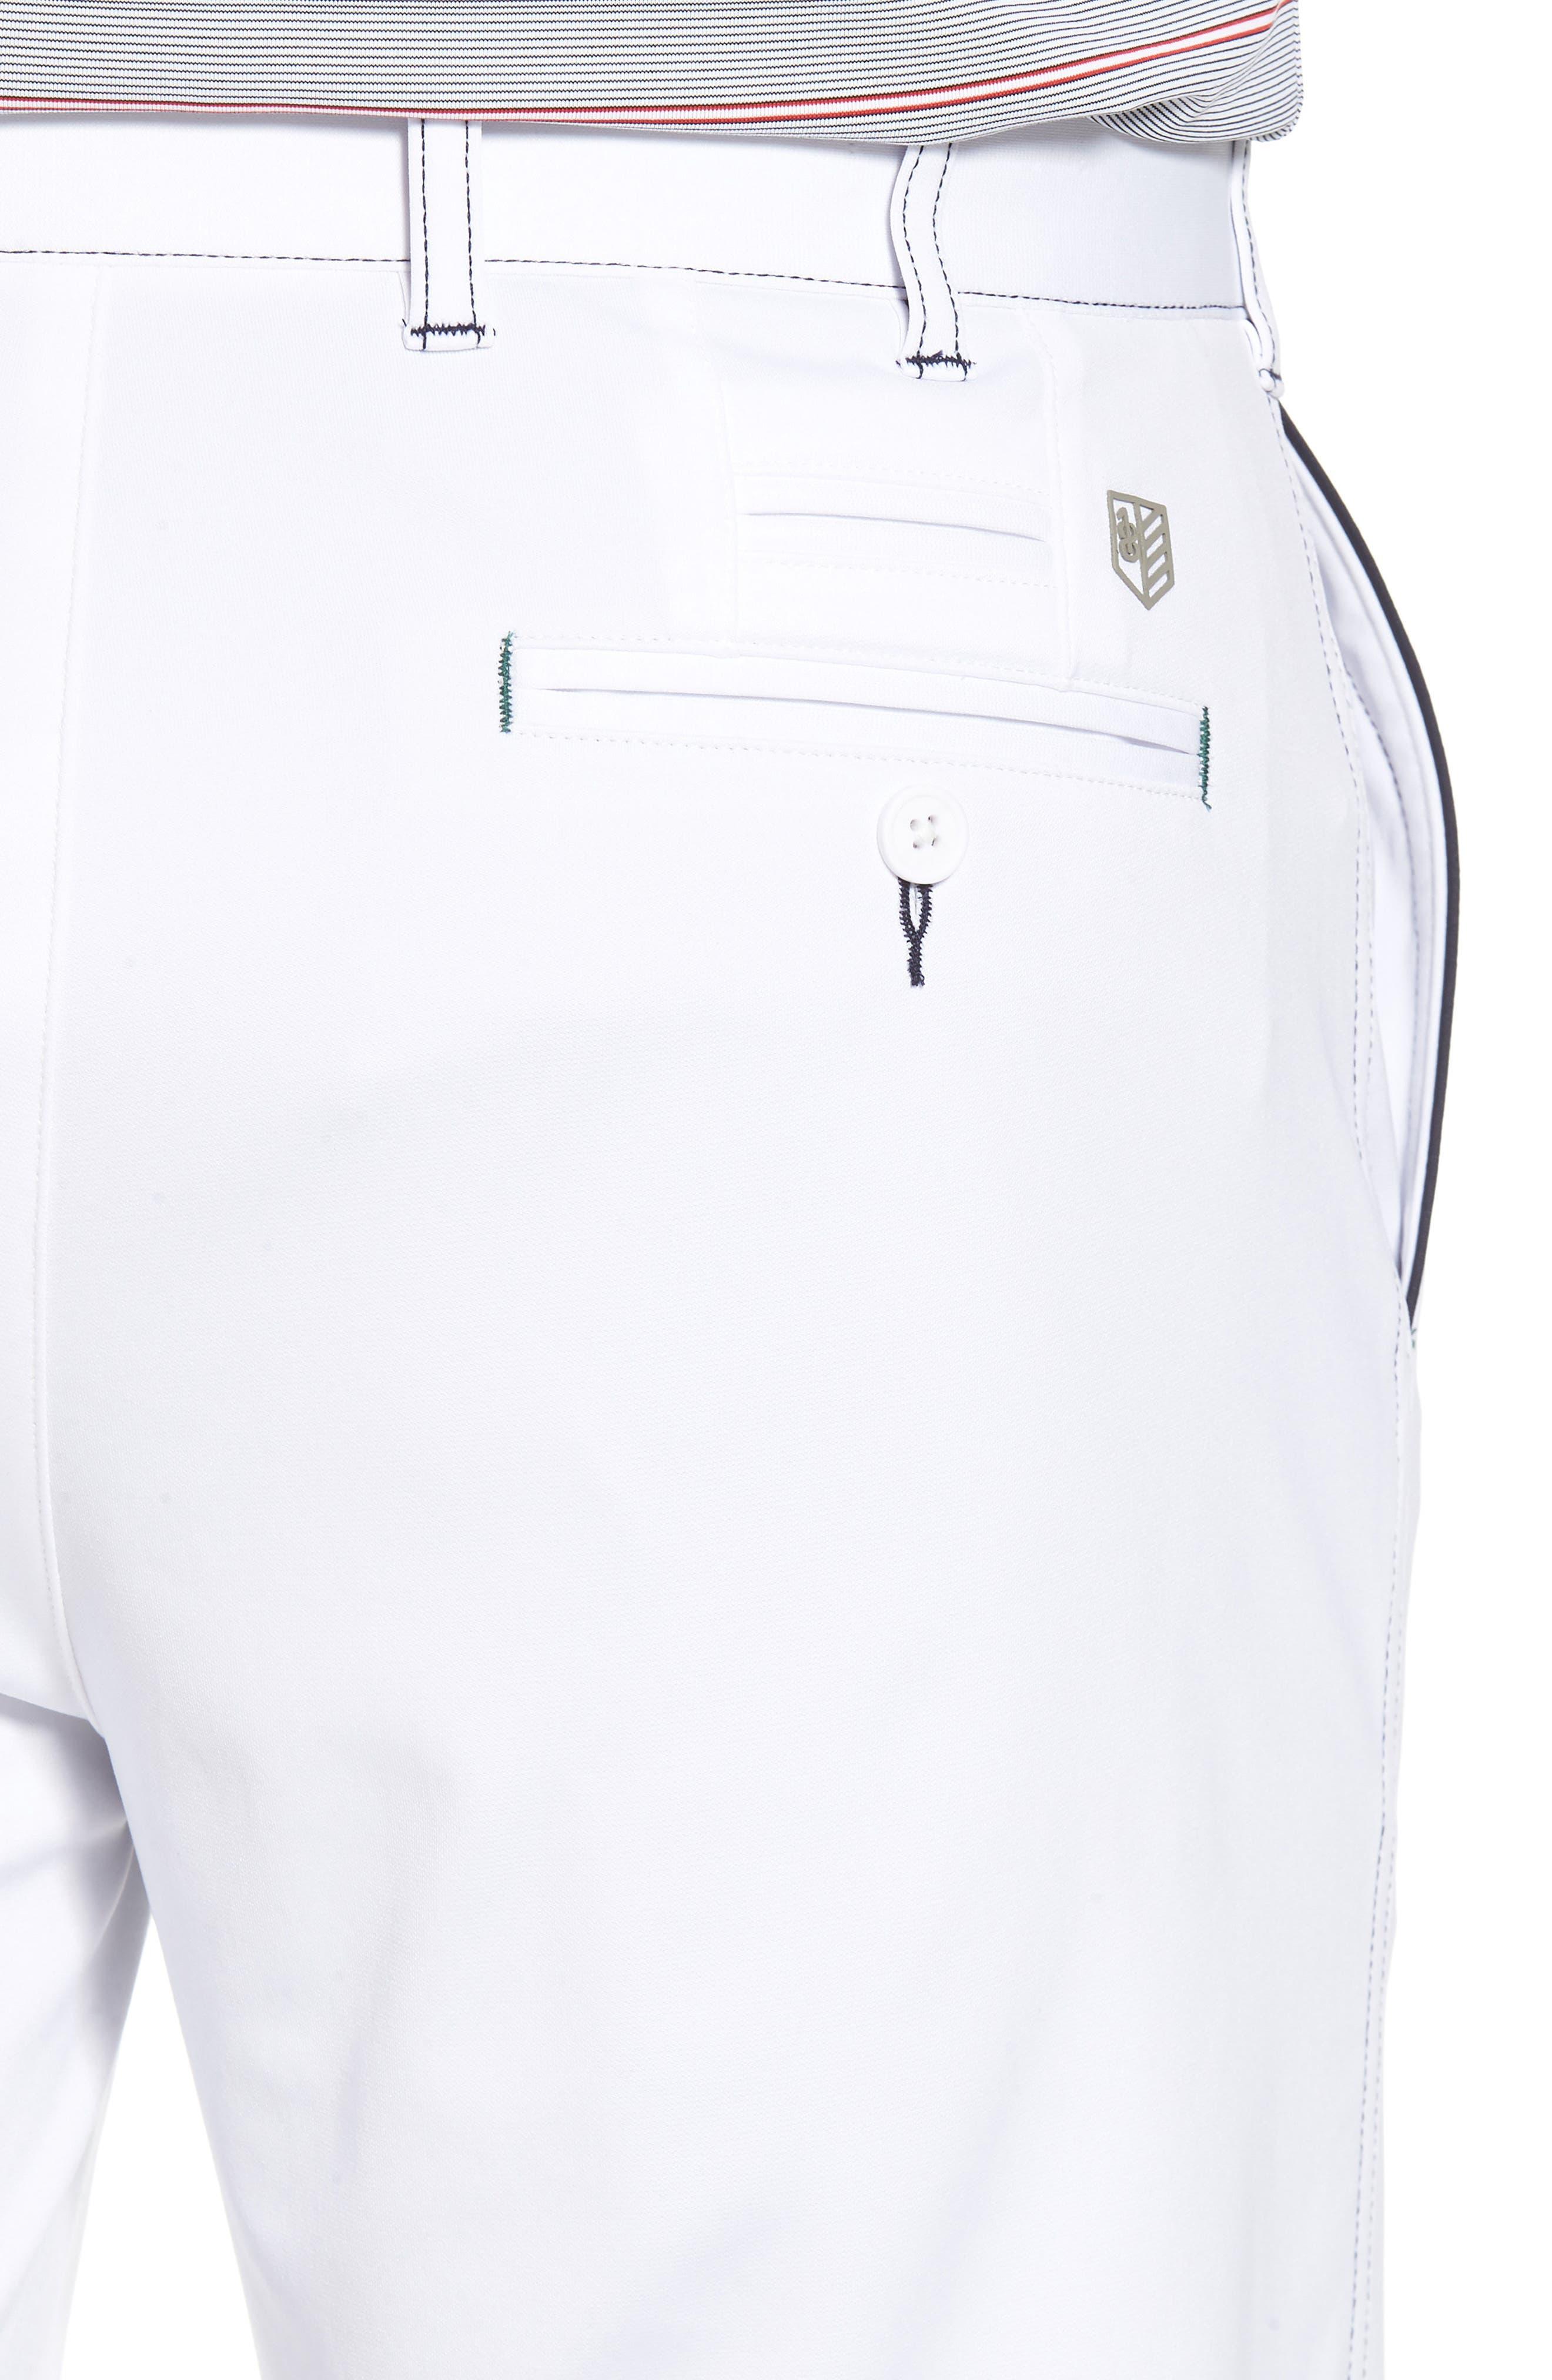 Trim Fit Tech Chino Shorts,                             Alternate thumbnail 4, color,                             White